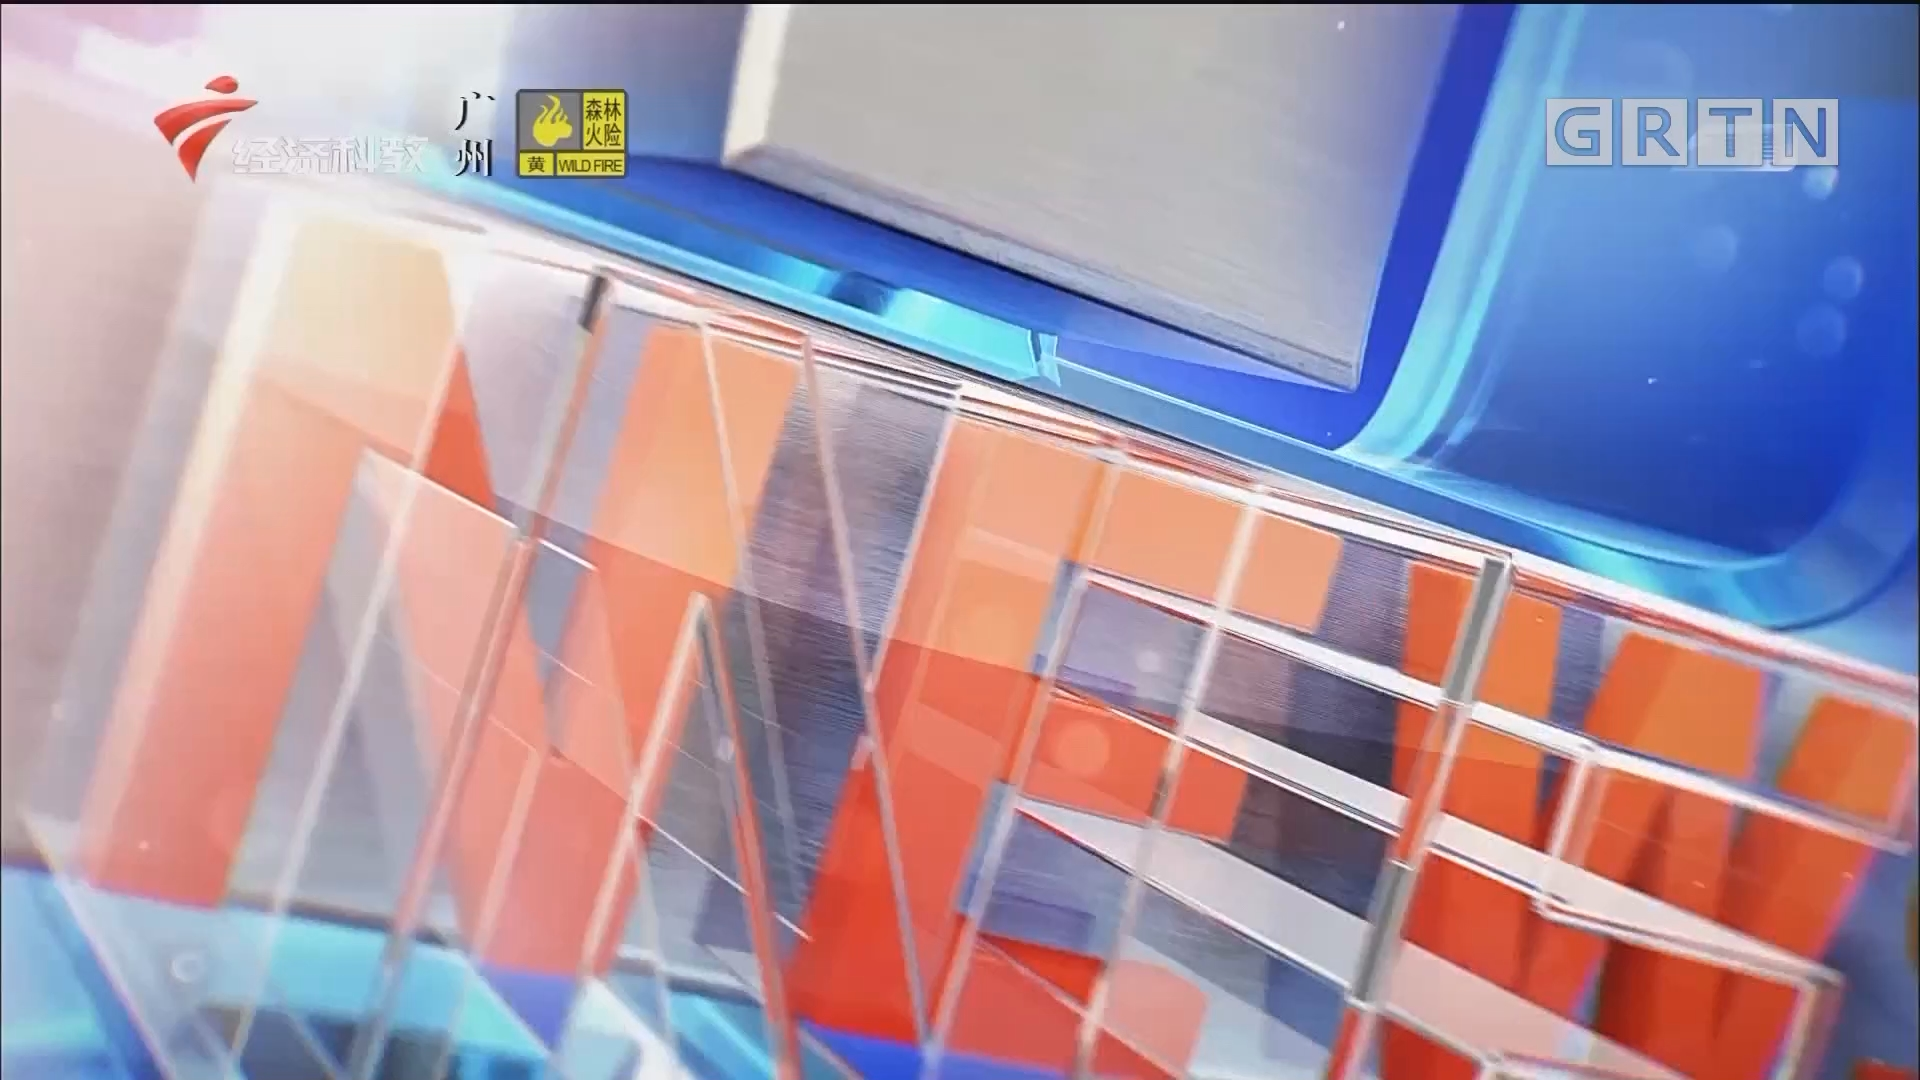 [HD][2020-02-25]南方財經報道:廣東隊再出發 30名心理醫生馳援湖北